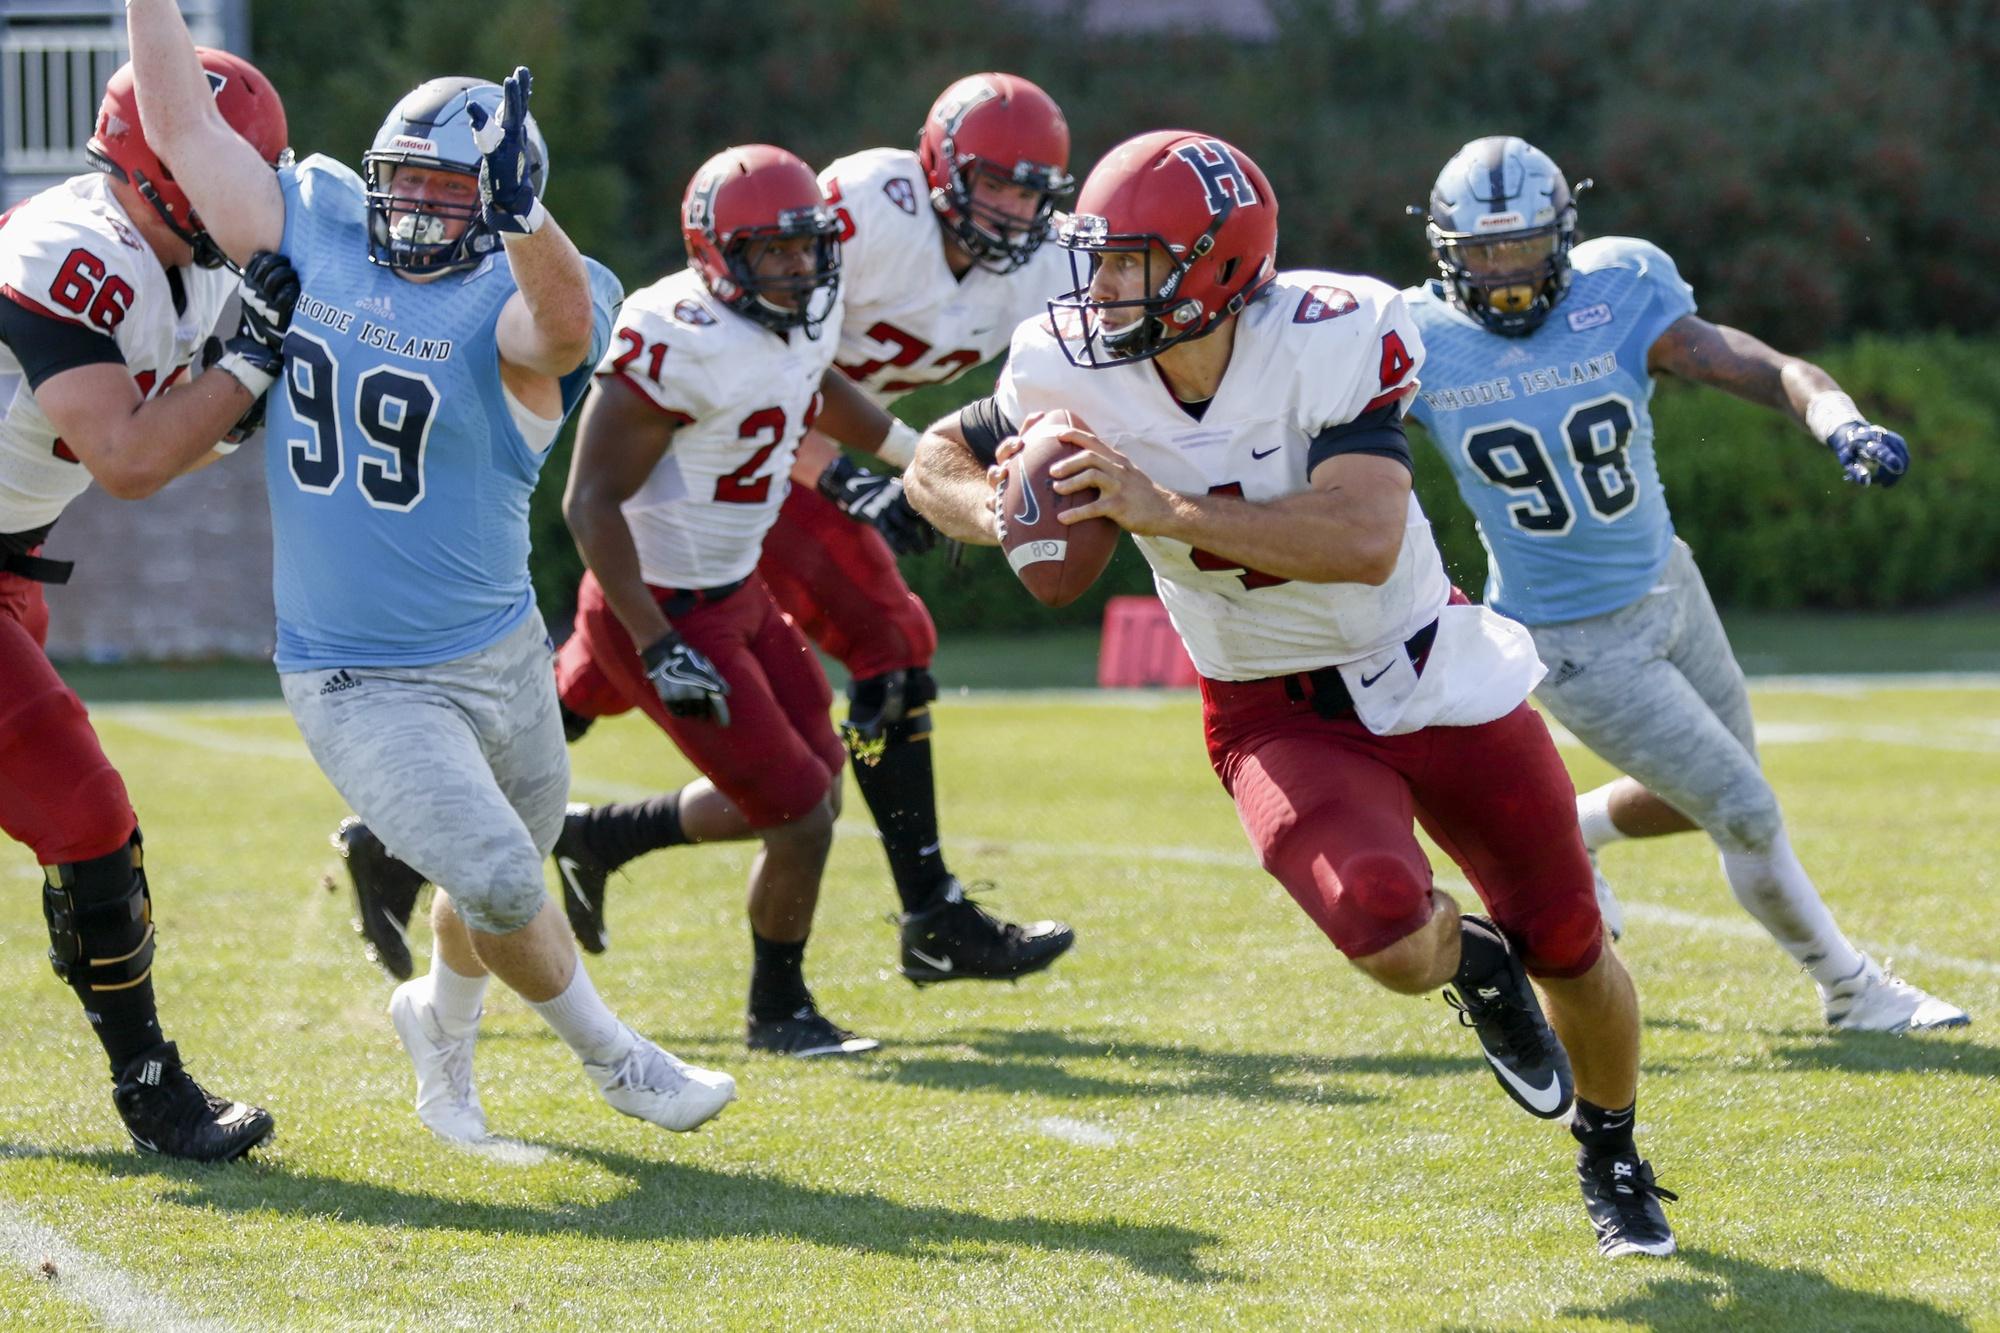 Senior quarterback Joe Viviano scrambles away from pressure in the season opener at Rhode Island.